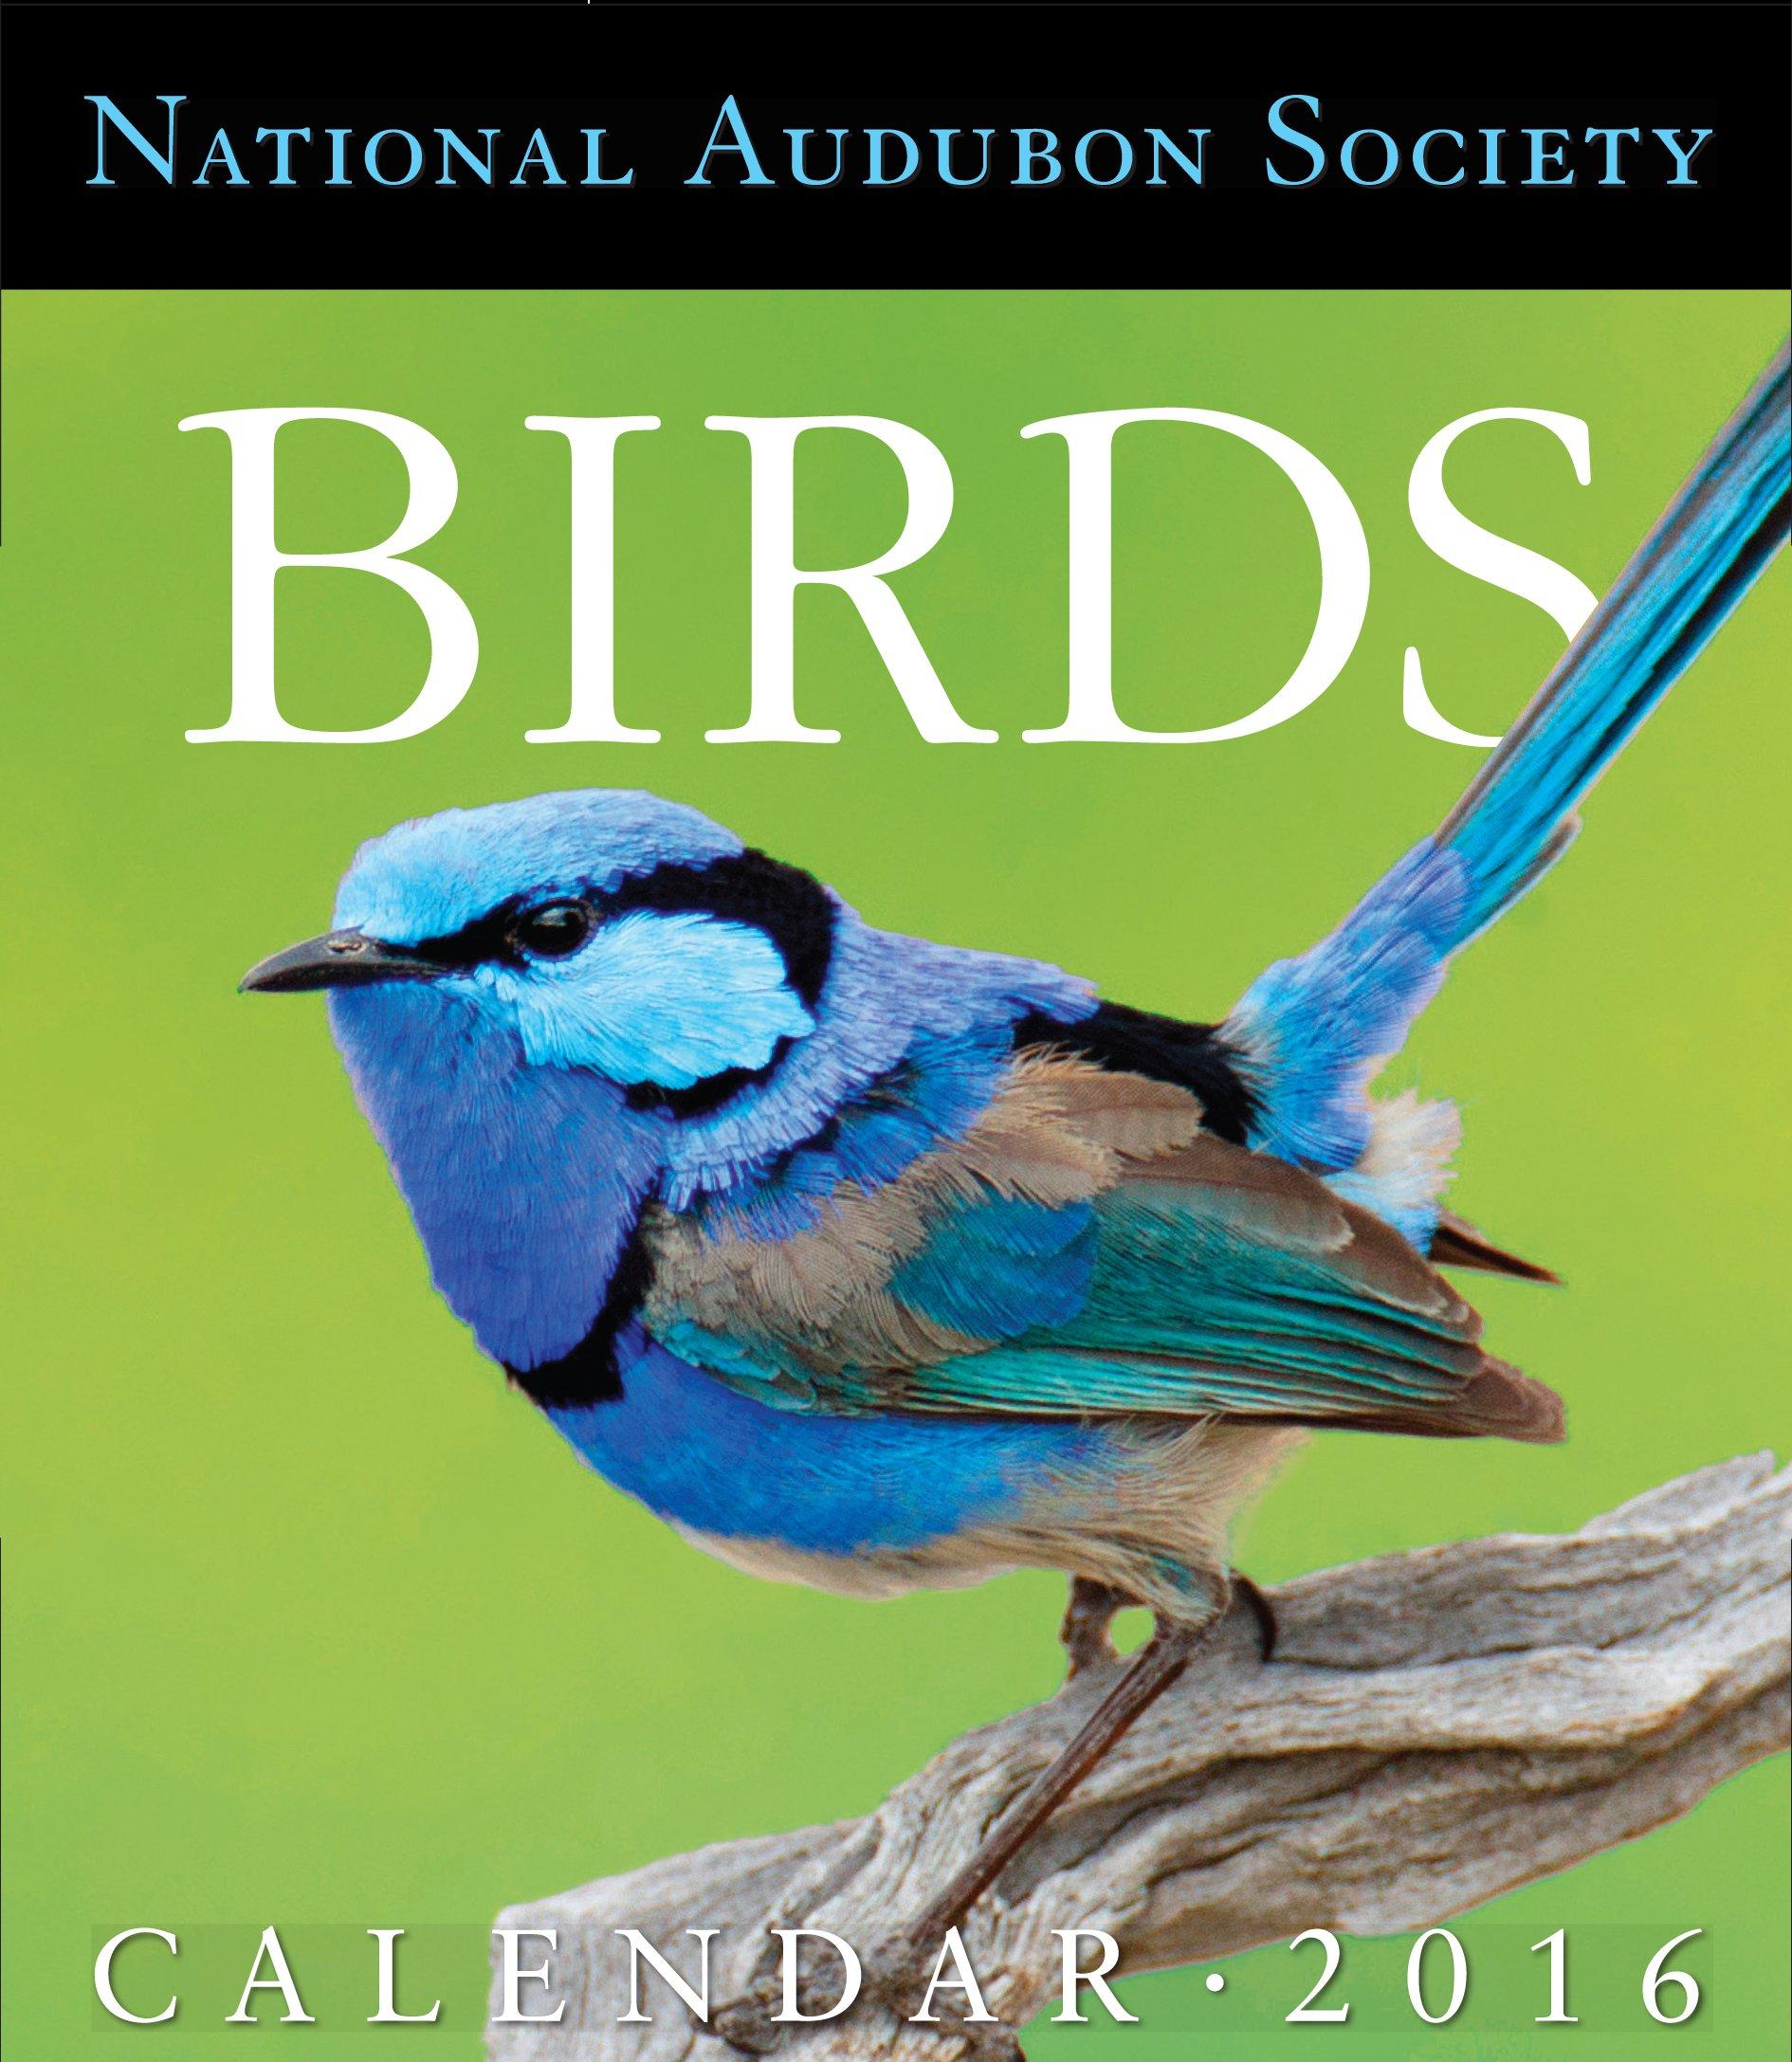 Amazon.com: Audubon Birds Page-A-Day Gallery Calendar 2016 ... on house wren house plans, purple martin house plans, pvc bluebird house plans, national wildlife bird house plans,